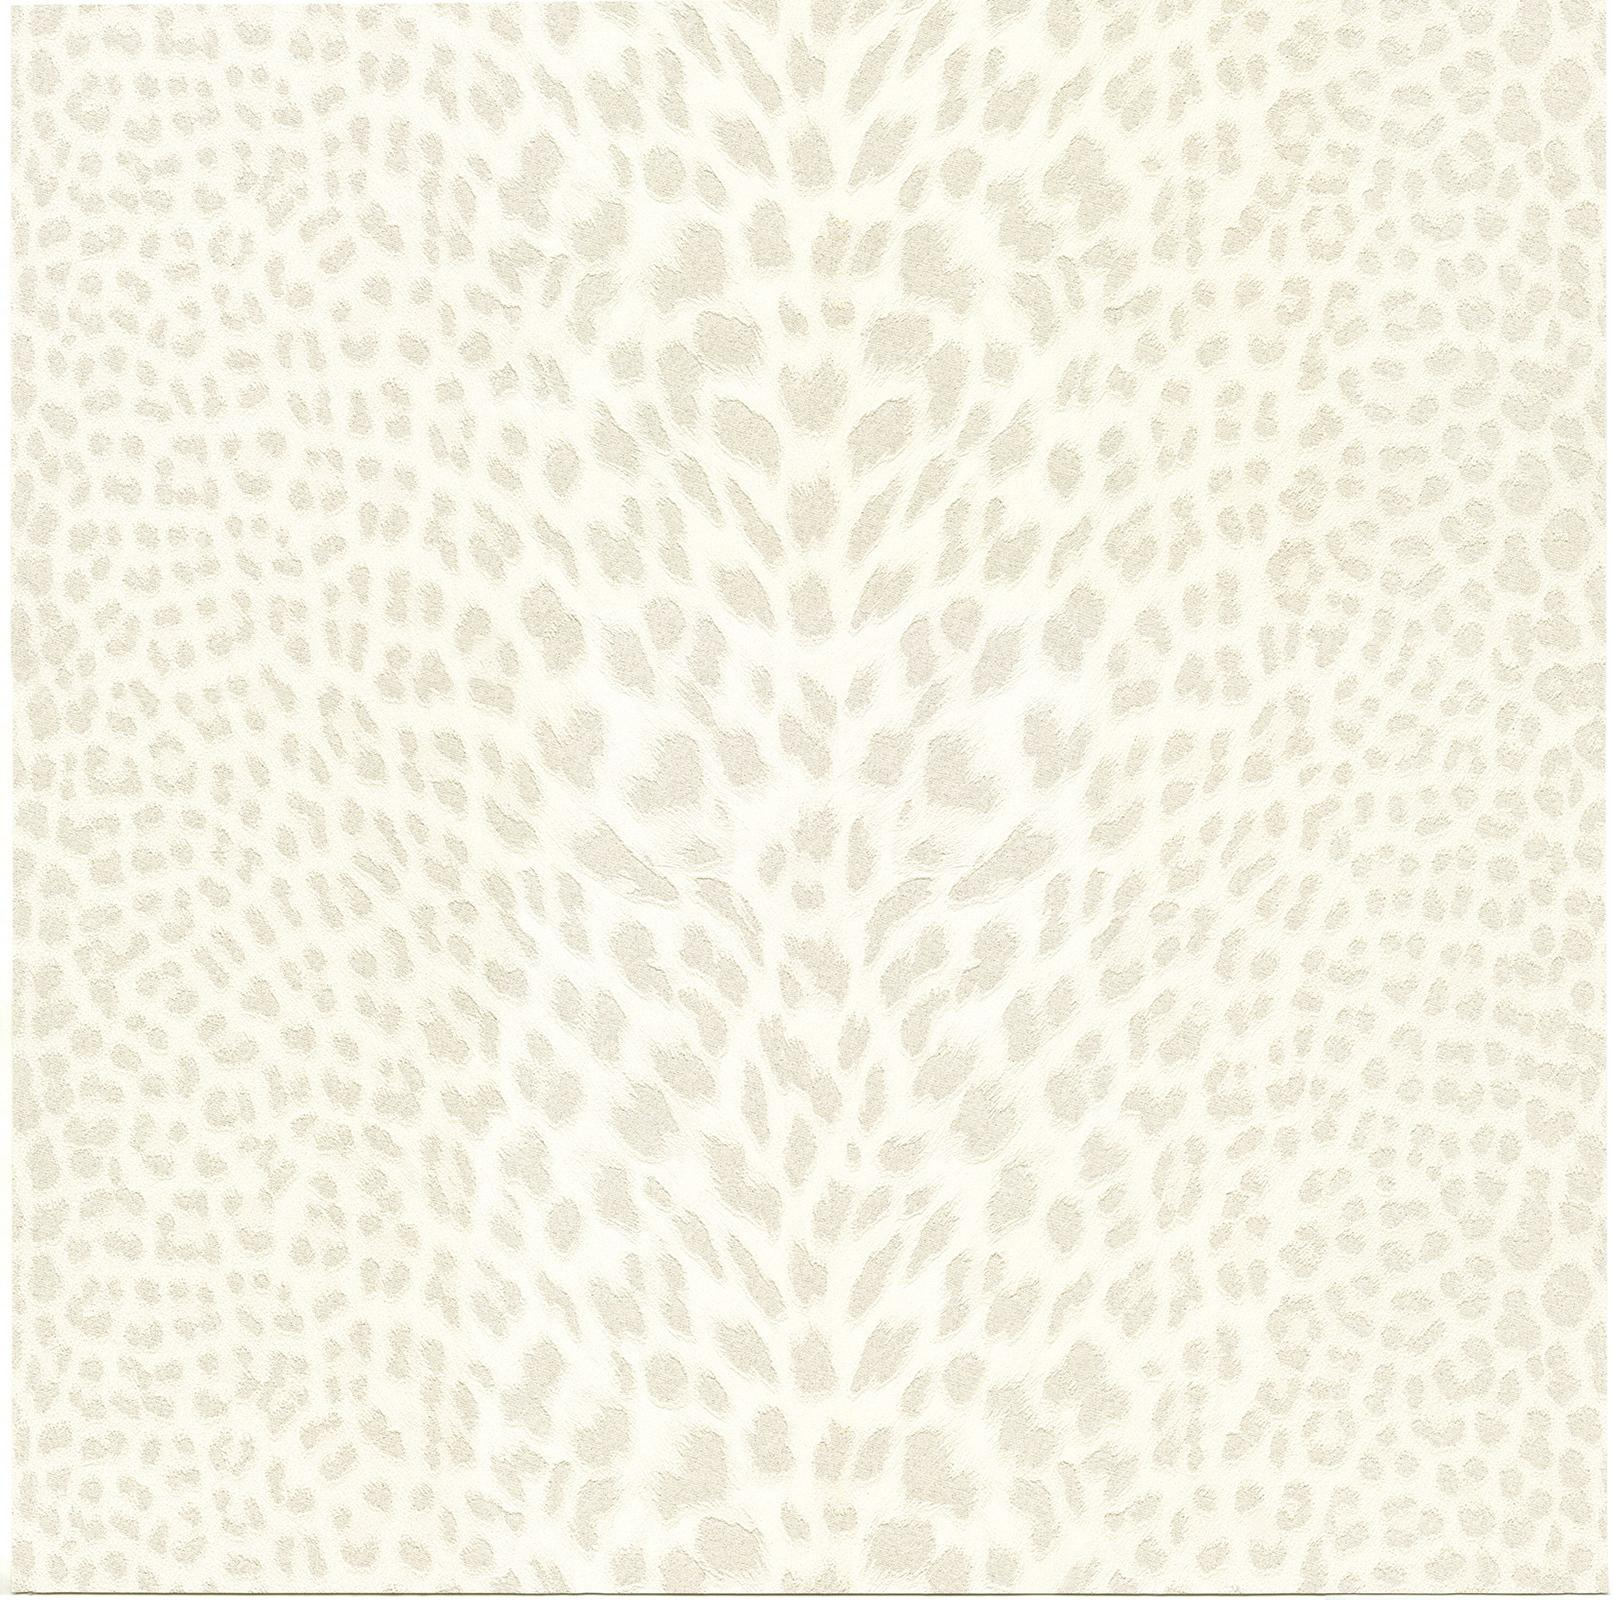 Roberto Cavalli RC12018 Leopard Wallpaper Volume 2 Fashion 1614x1600